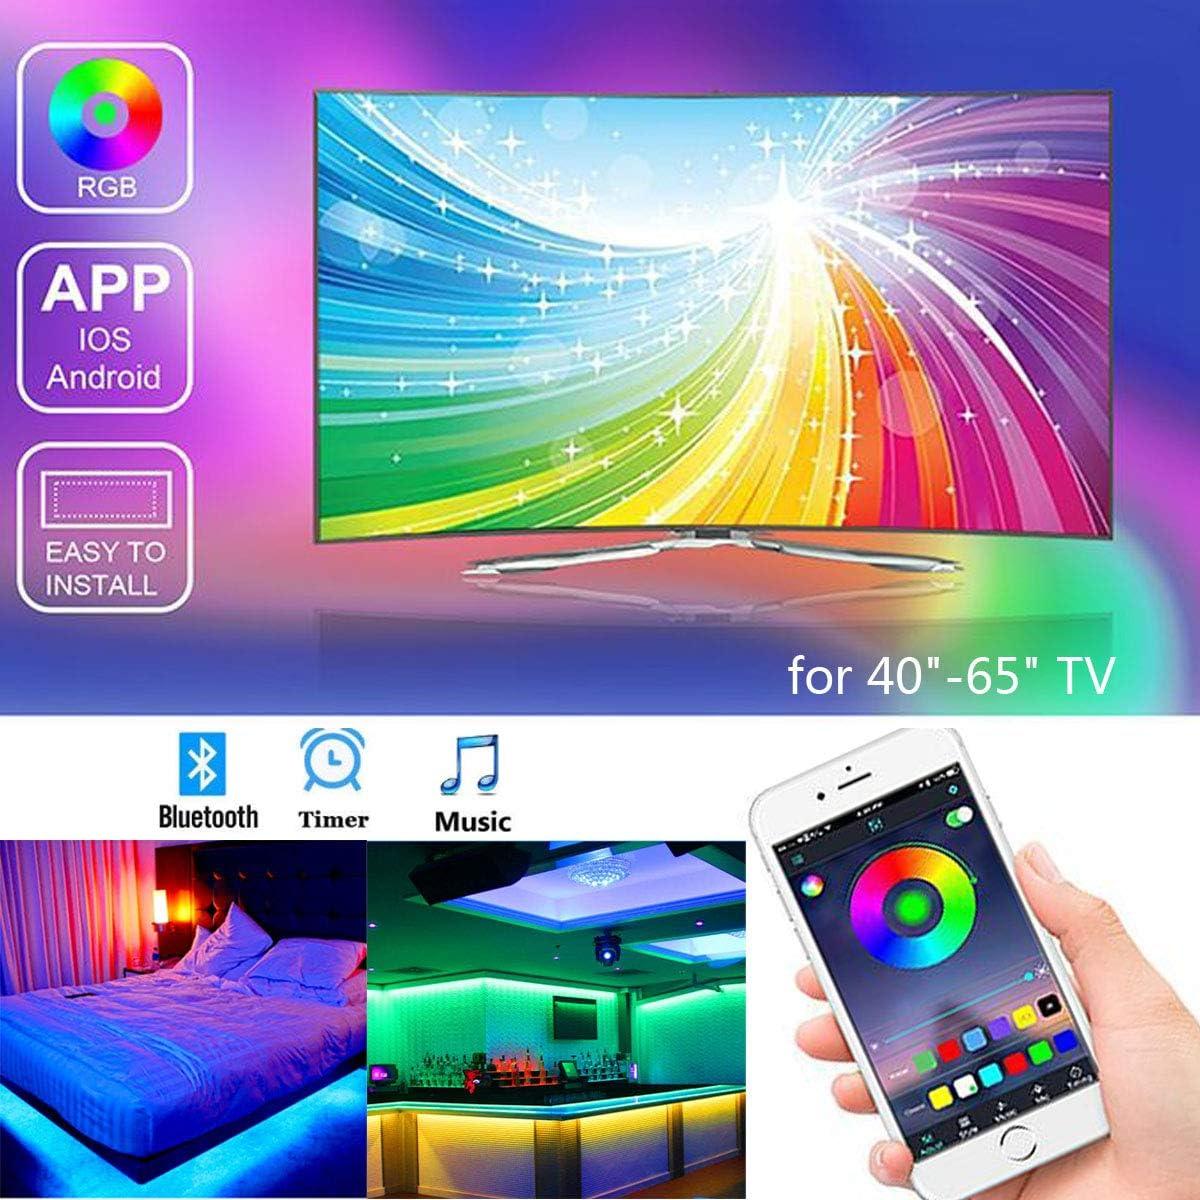 Tira Led TV 2M, Banda RGB LED alimentada por USB para TV de 40 a-60 pulgadas, Control mediante APP, impermeabilidad IP65, para Android e iOS.: Amazon.es: Iluminación